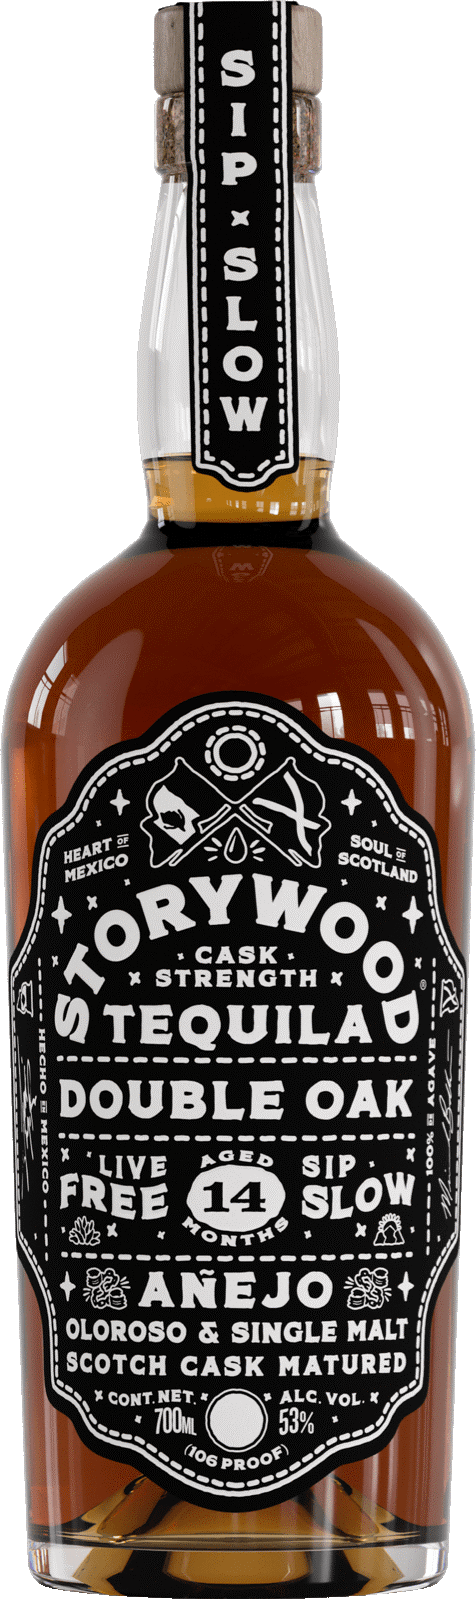 Storywood Tequila Double Oak CS